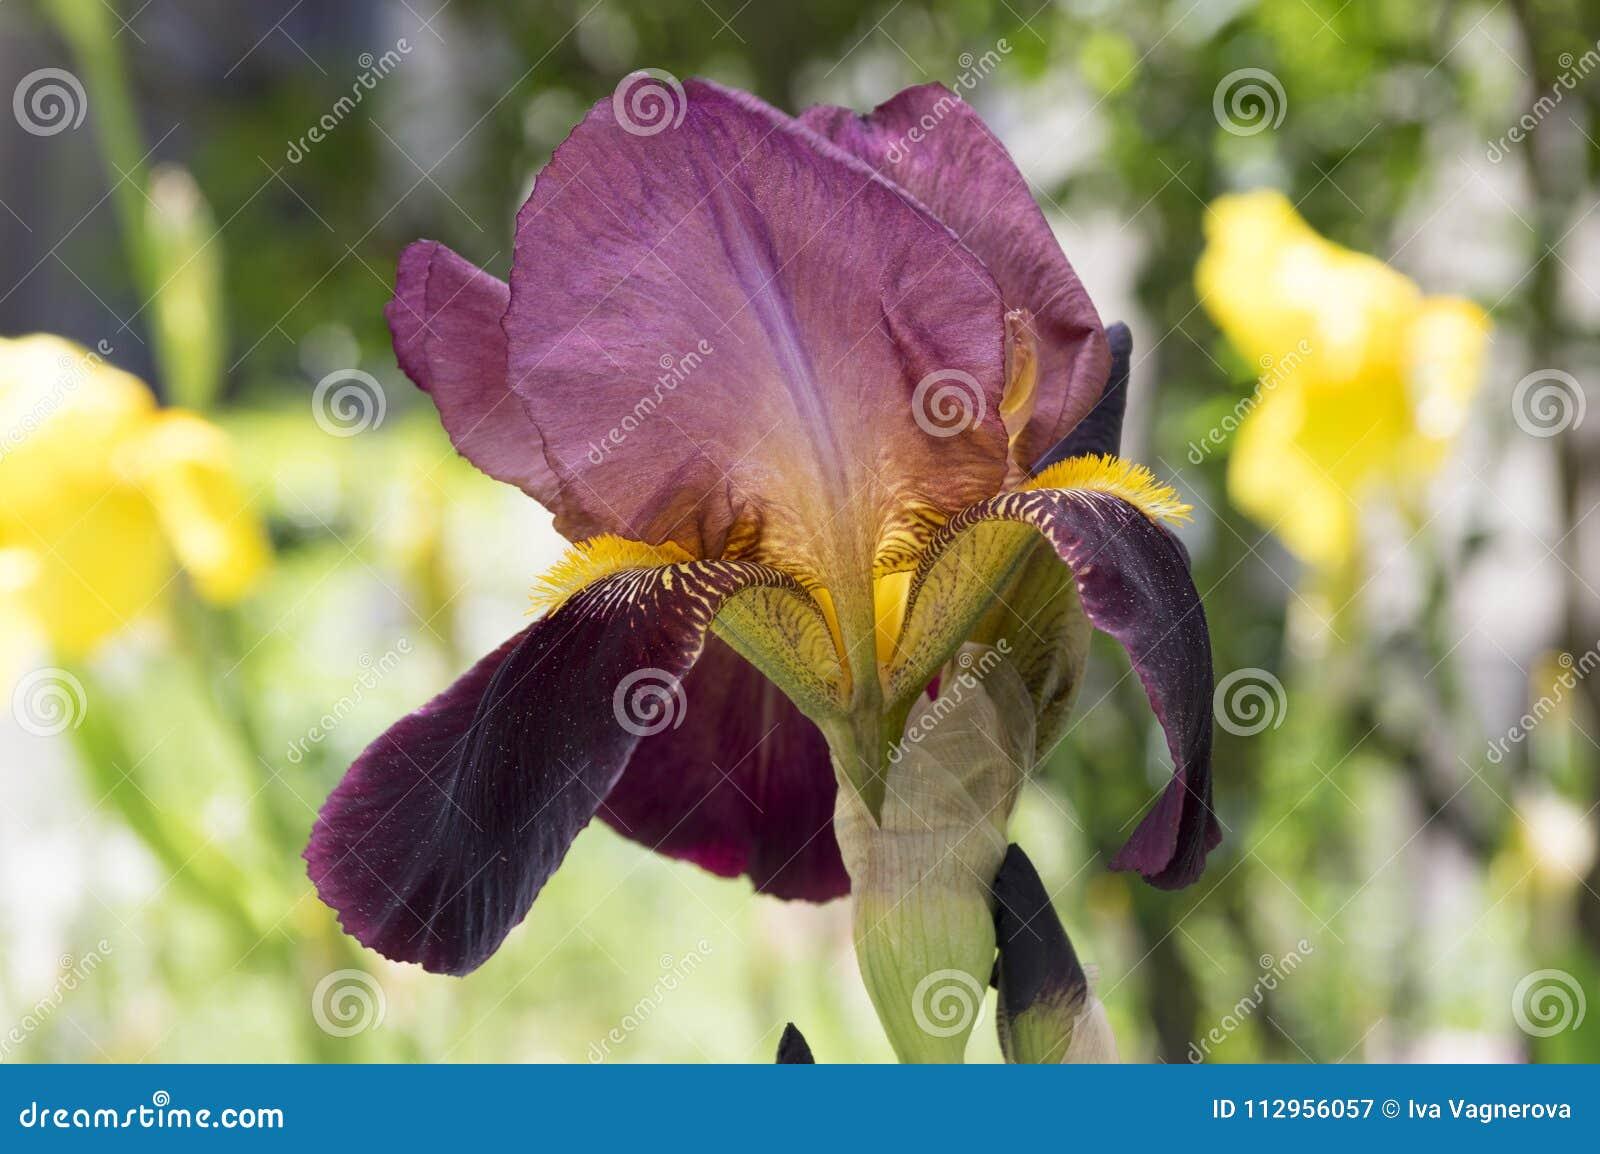 Bearded Iris Flower Iris Germanica In Bloom With Rain Drops Stock